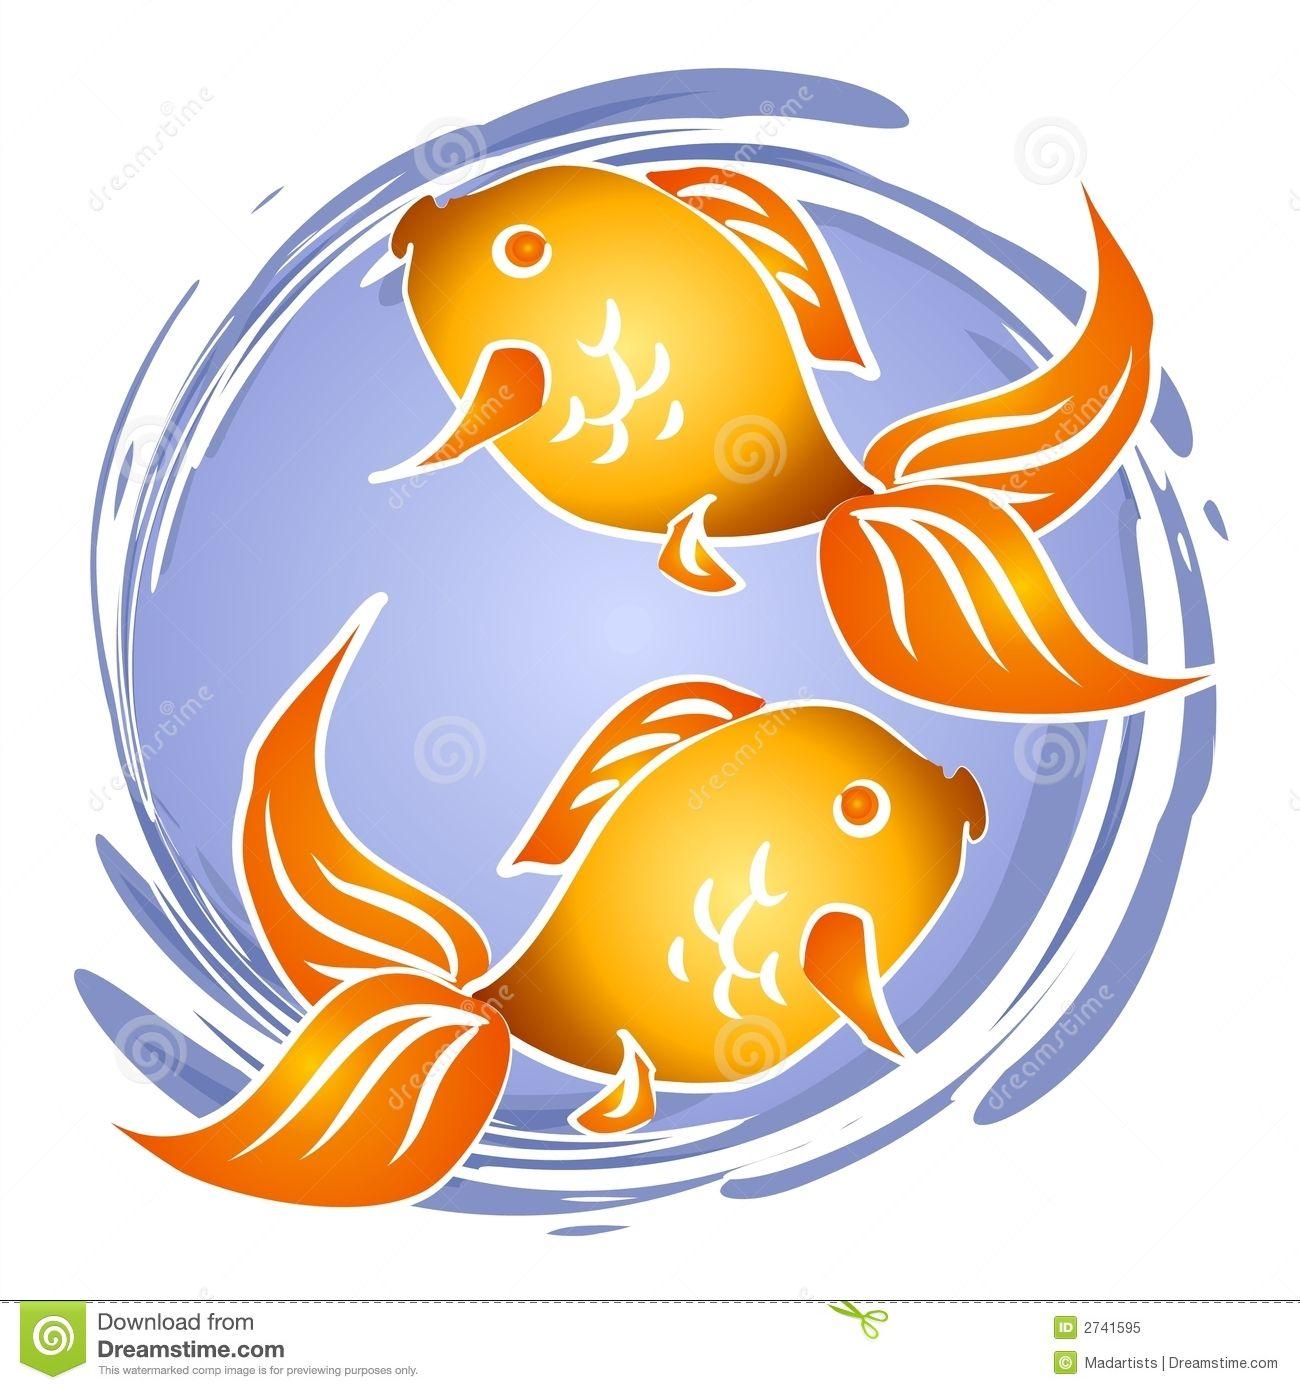 Goldfish clipart colorful fish. Bowl clip art royalty